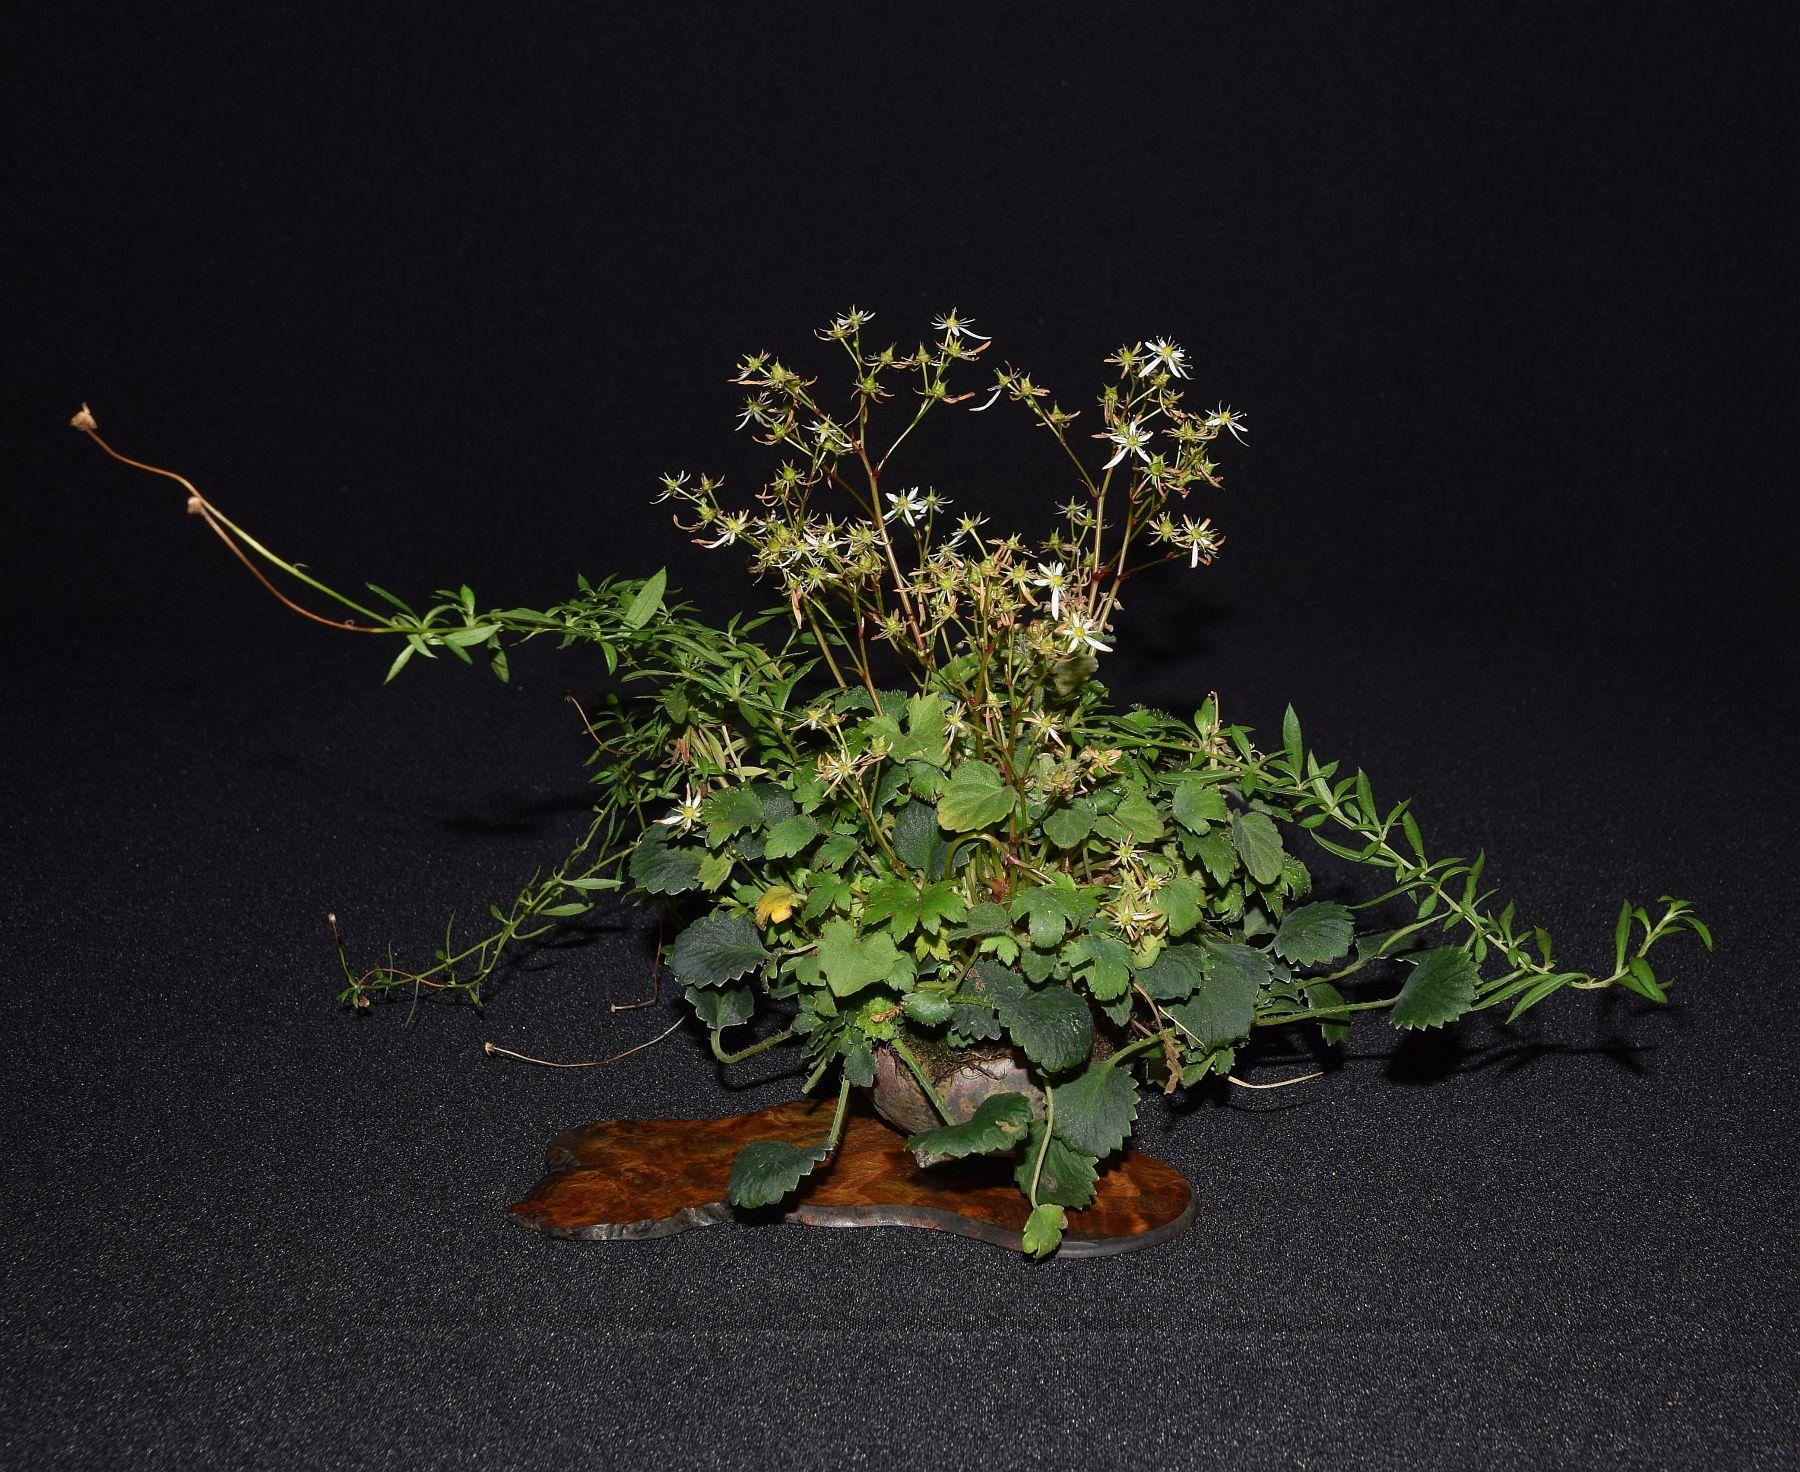 bonsai-museum-luis-vallejo-007